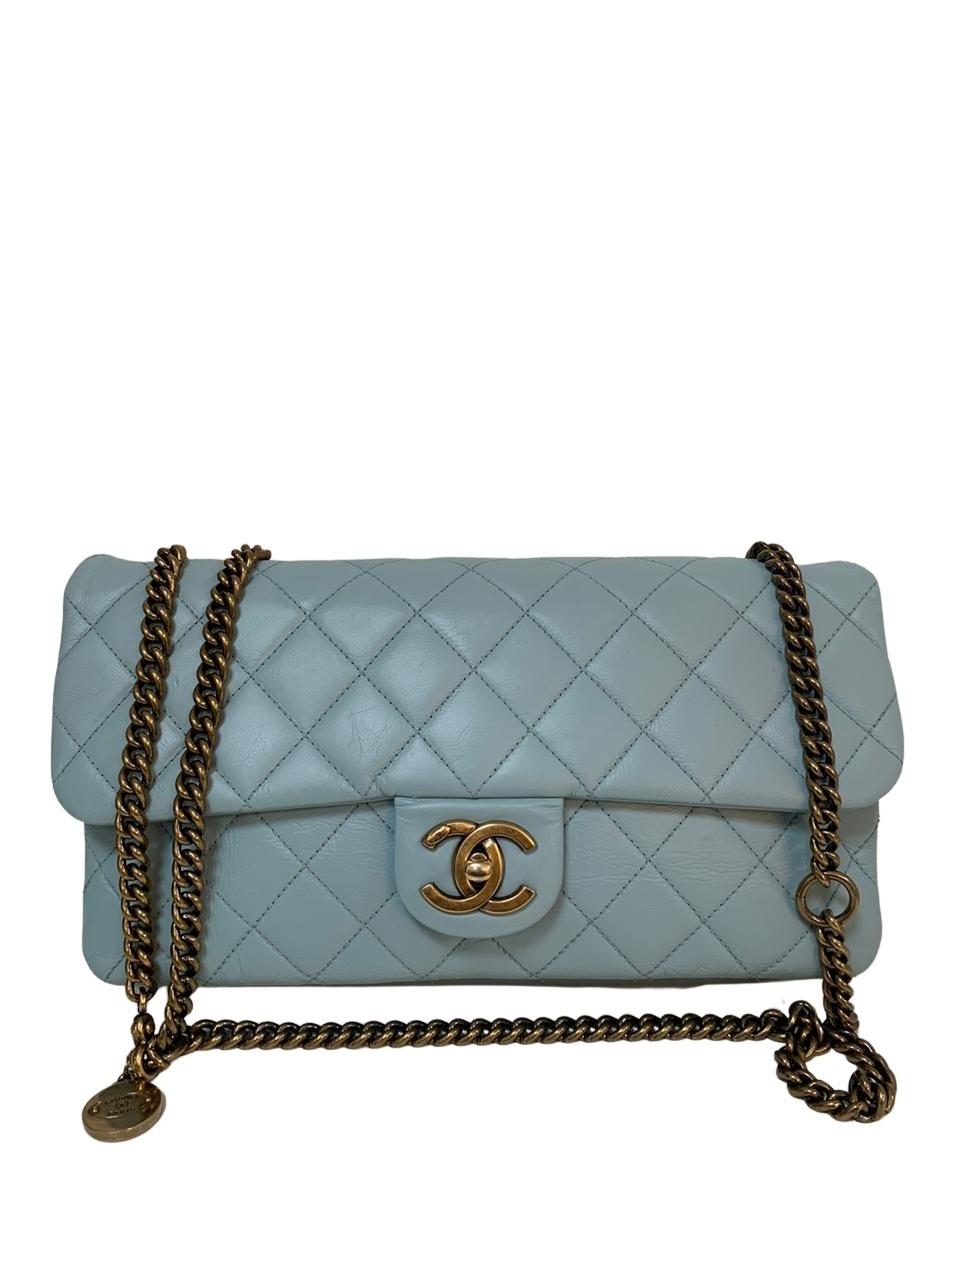 Bolsa Chanel Easy Flap Couro Lambskin Azul Bebê